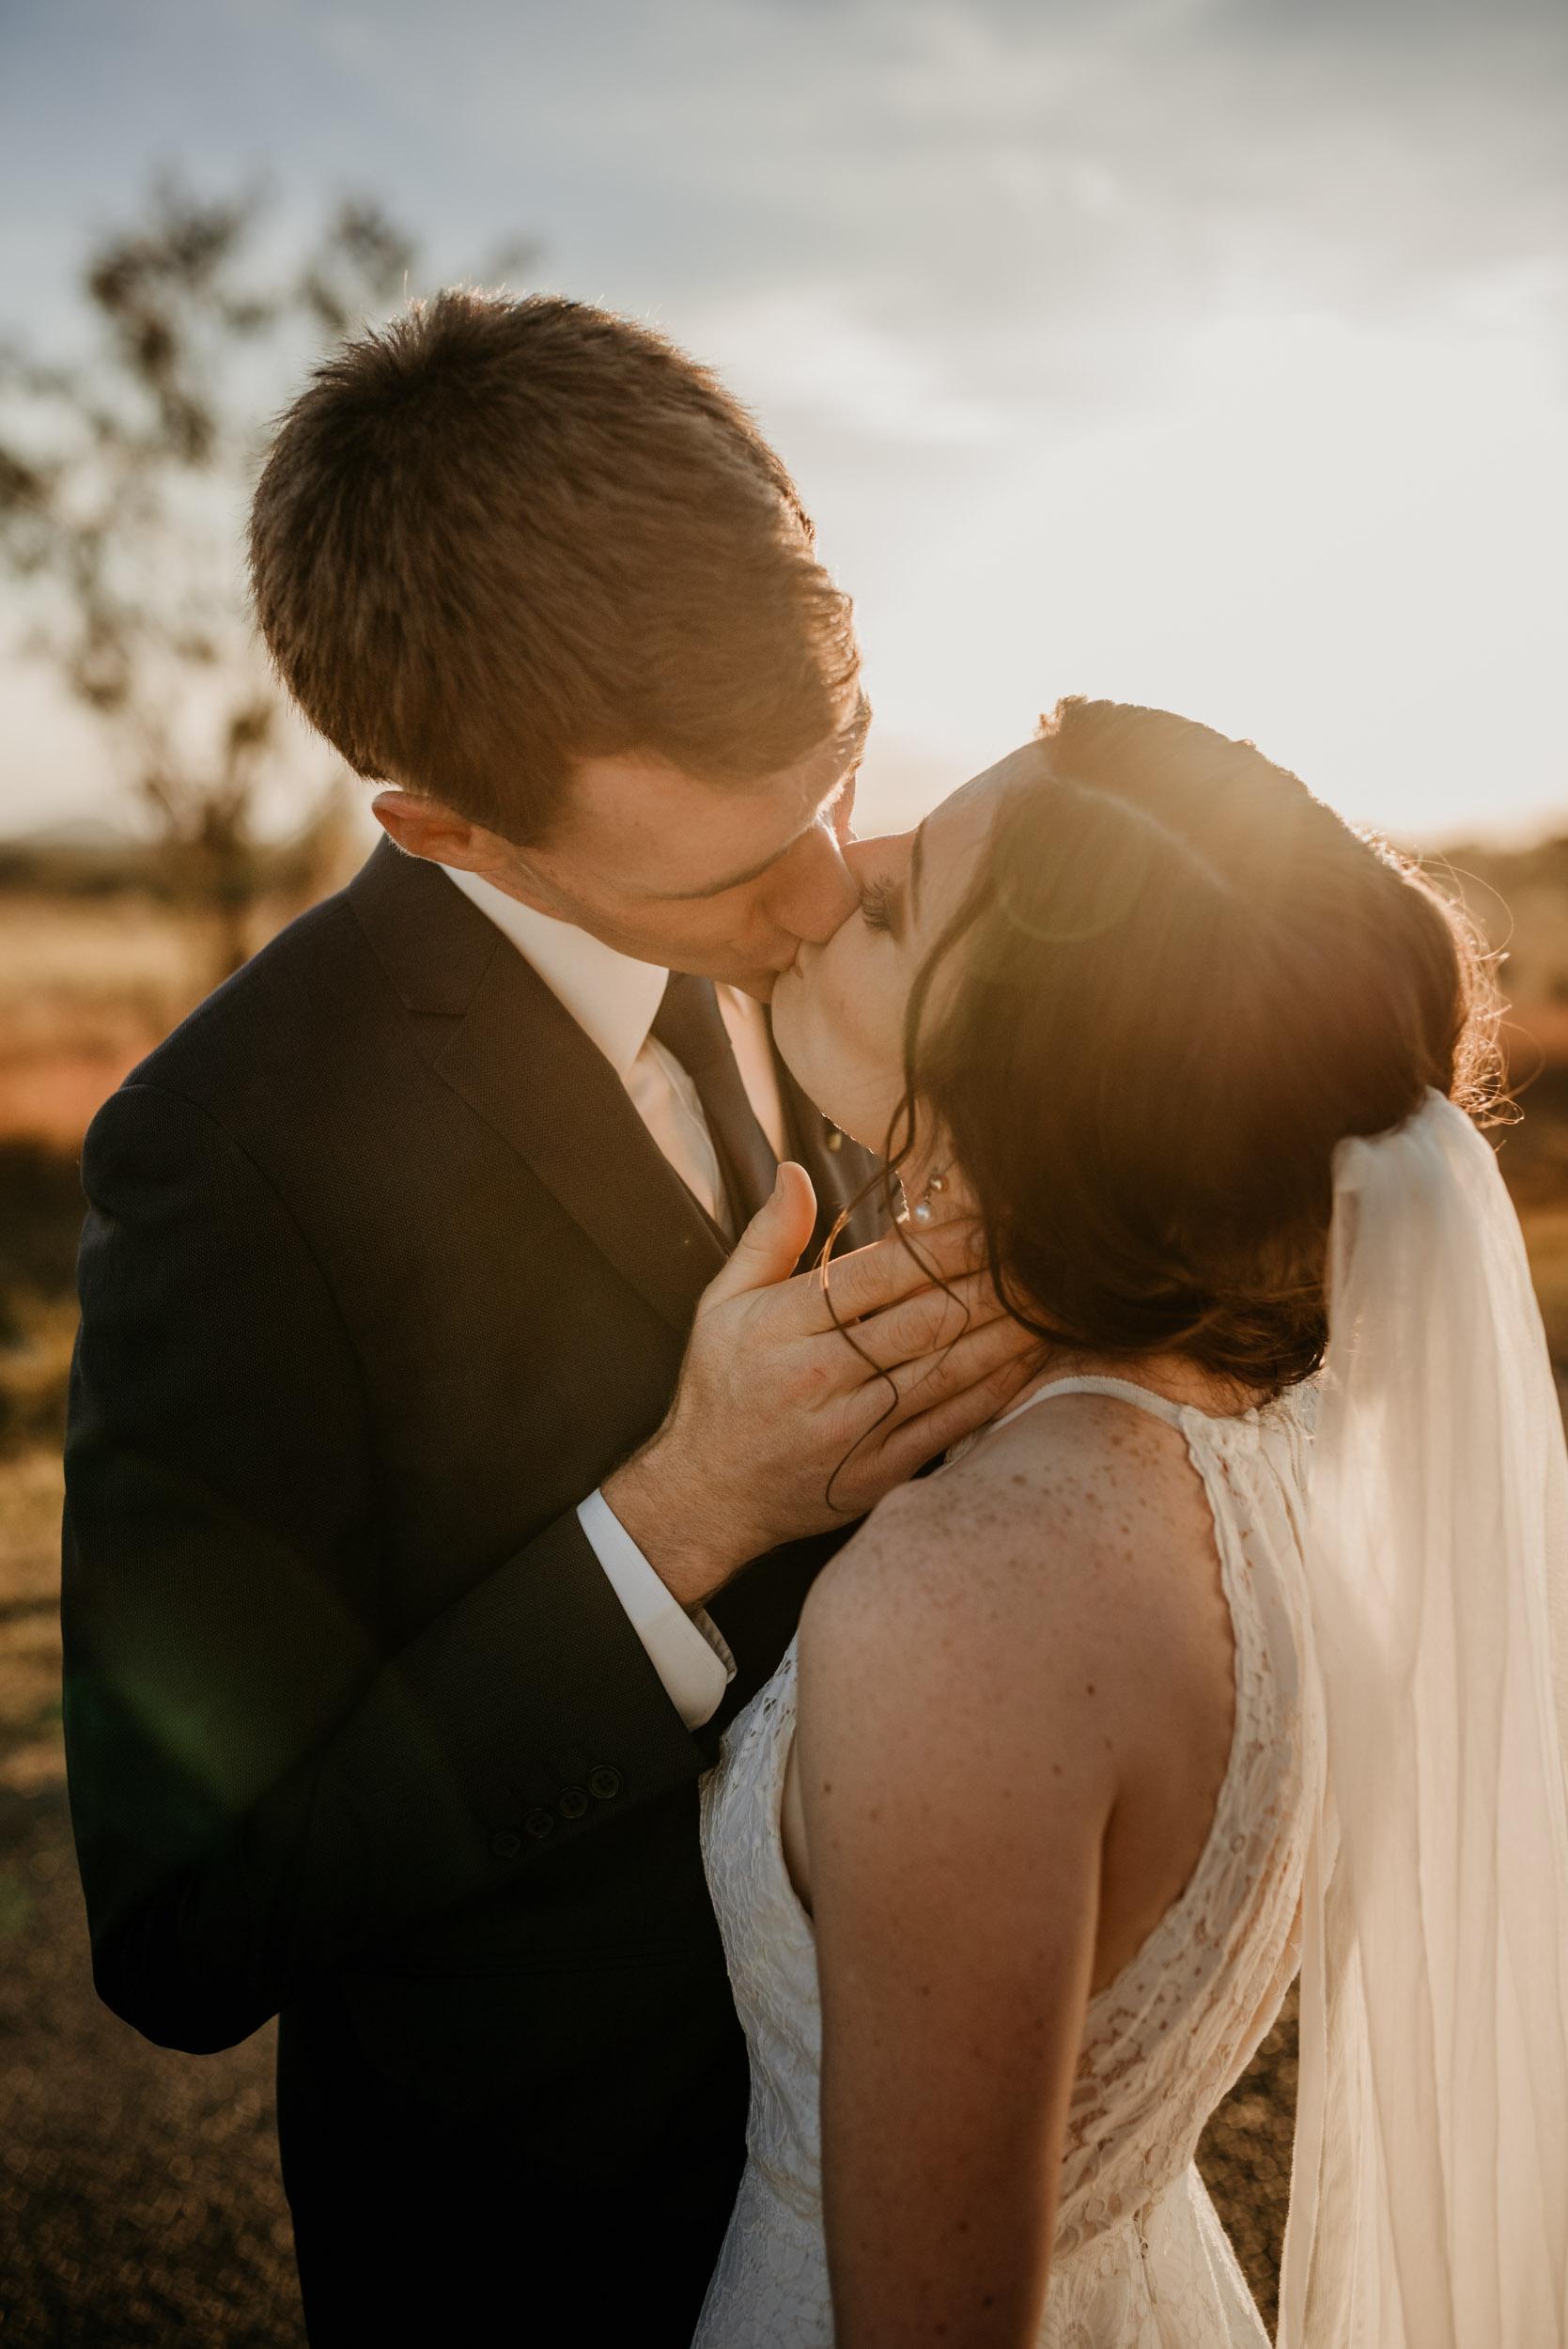 The Raw Photographer - Cairns Wedding Photographer - Atherton Tablelands Venue - Mareeba Photography-56.jpg